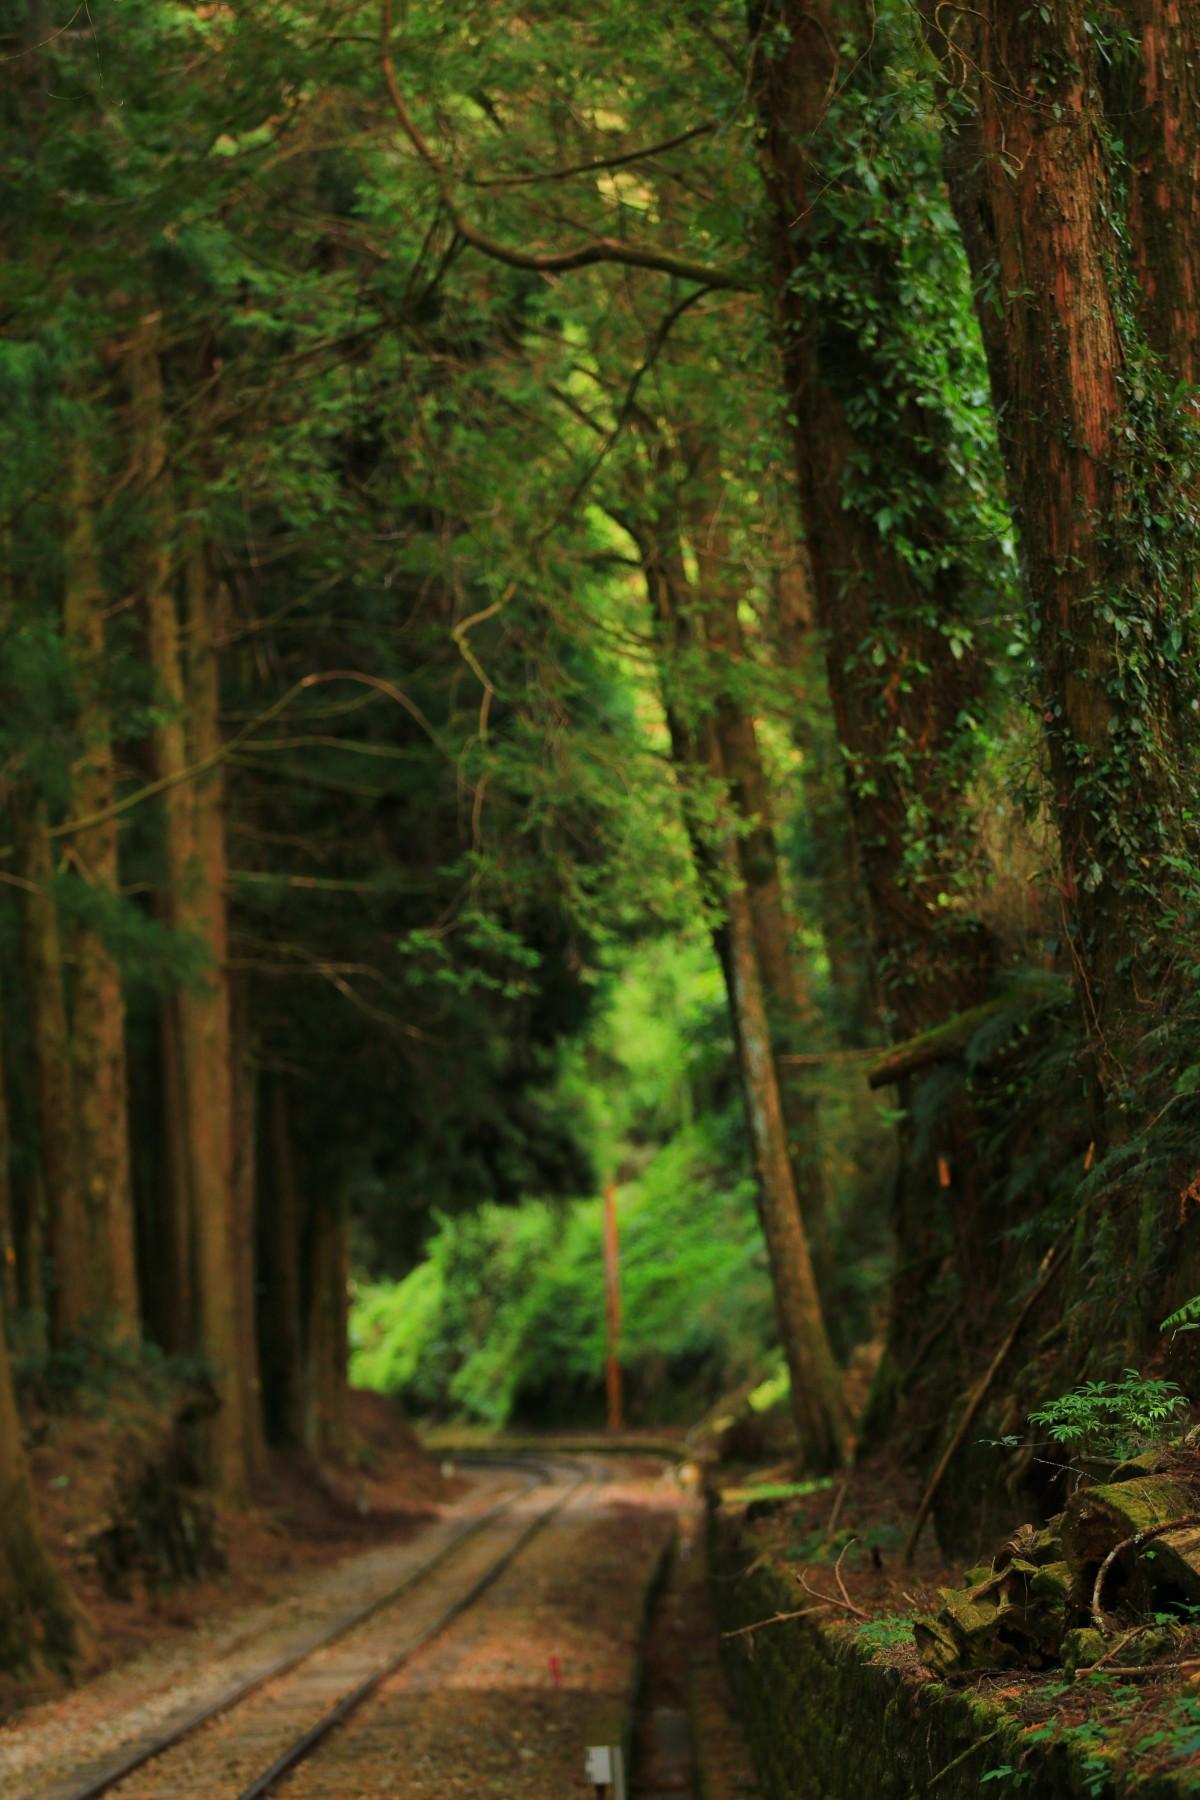 Free Images : tree, nature, railway, railroad, train track ... | 1200 x 1800 jpeg 406kB